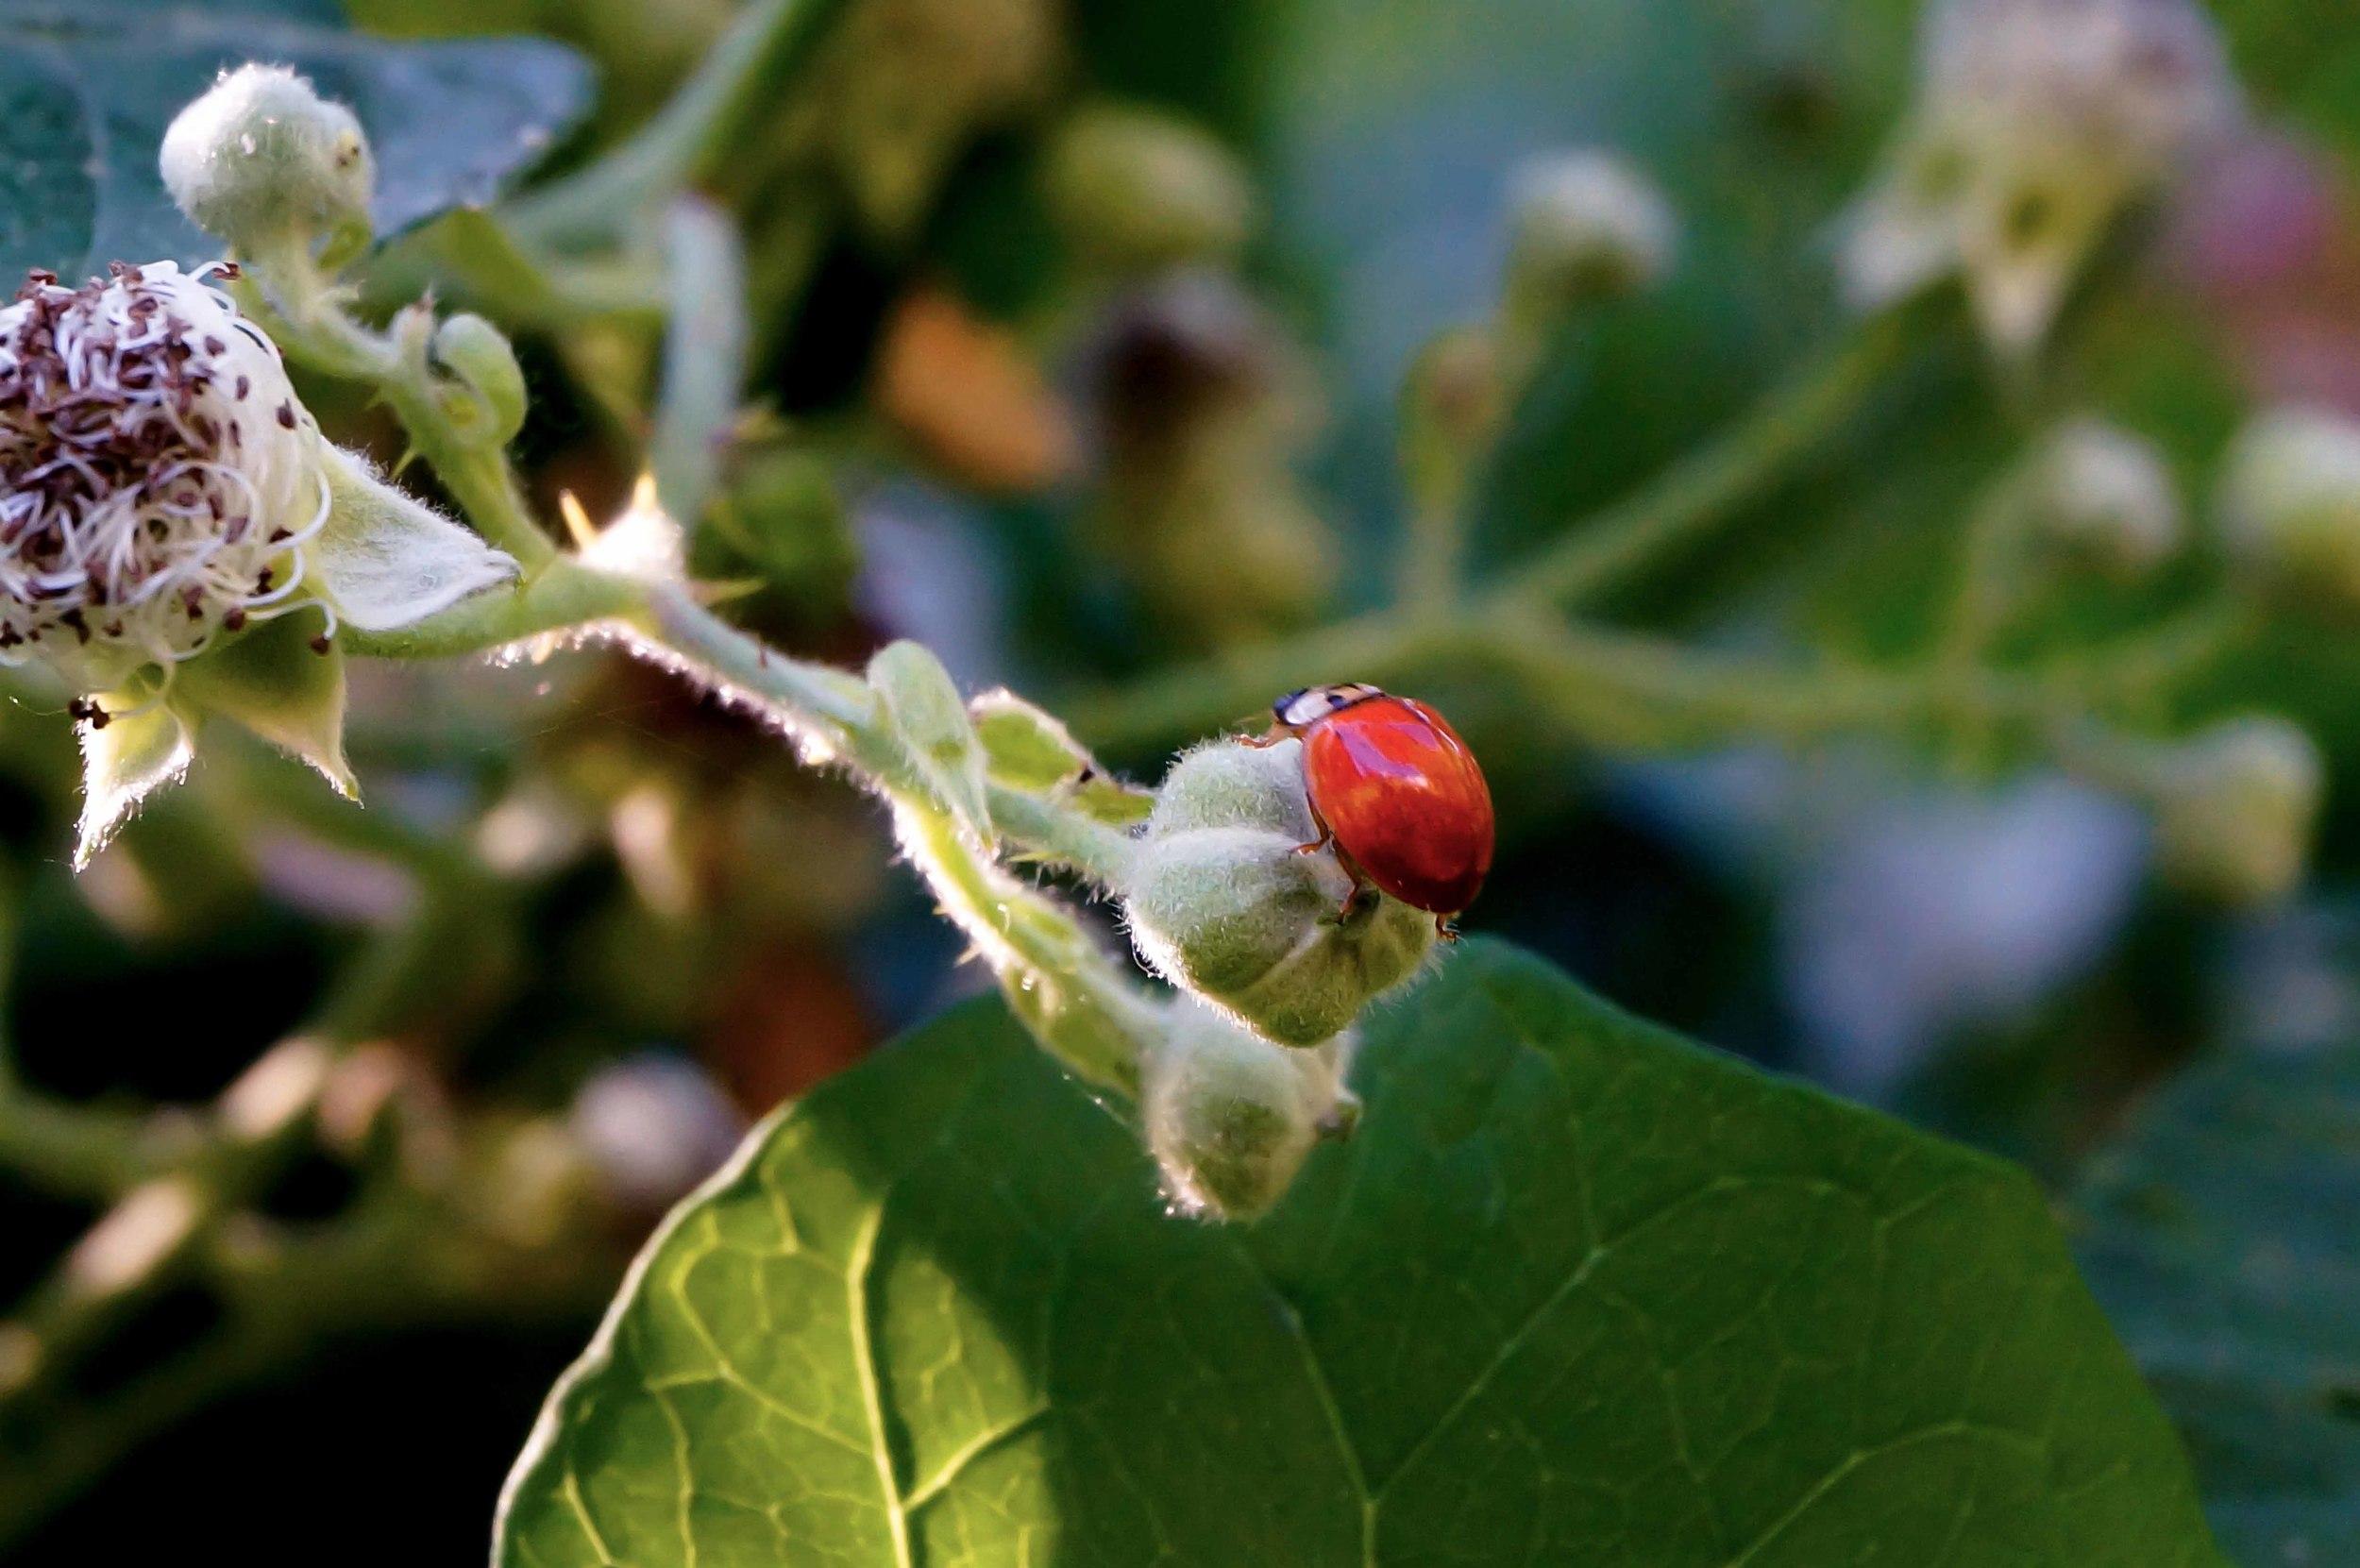 A ladybug by Hoy Creek. (Photo: Ed Paulino)